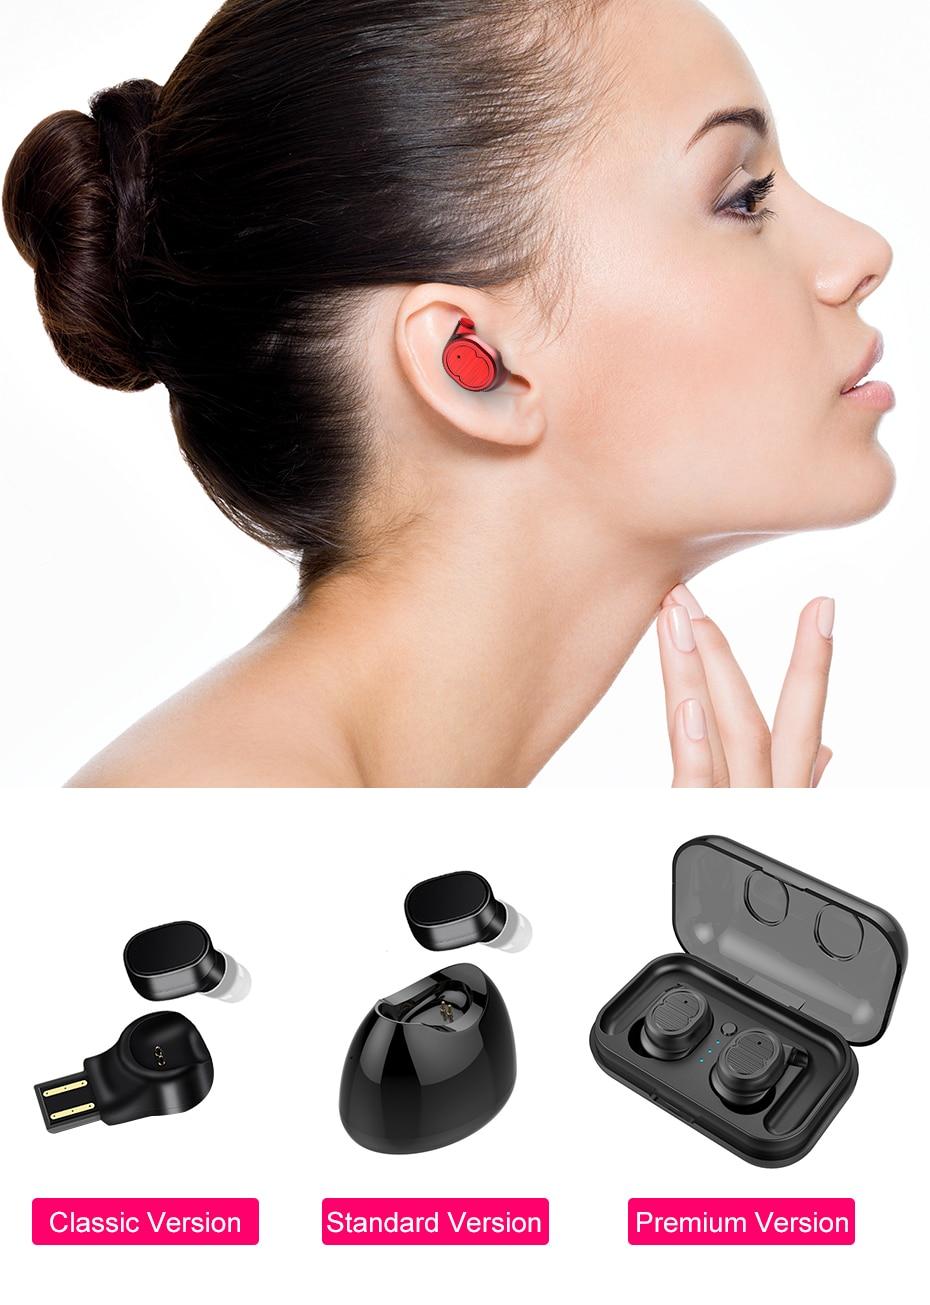 TWS8 Wireless Earphones Red | Cornmi